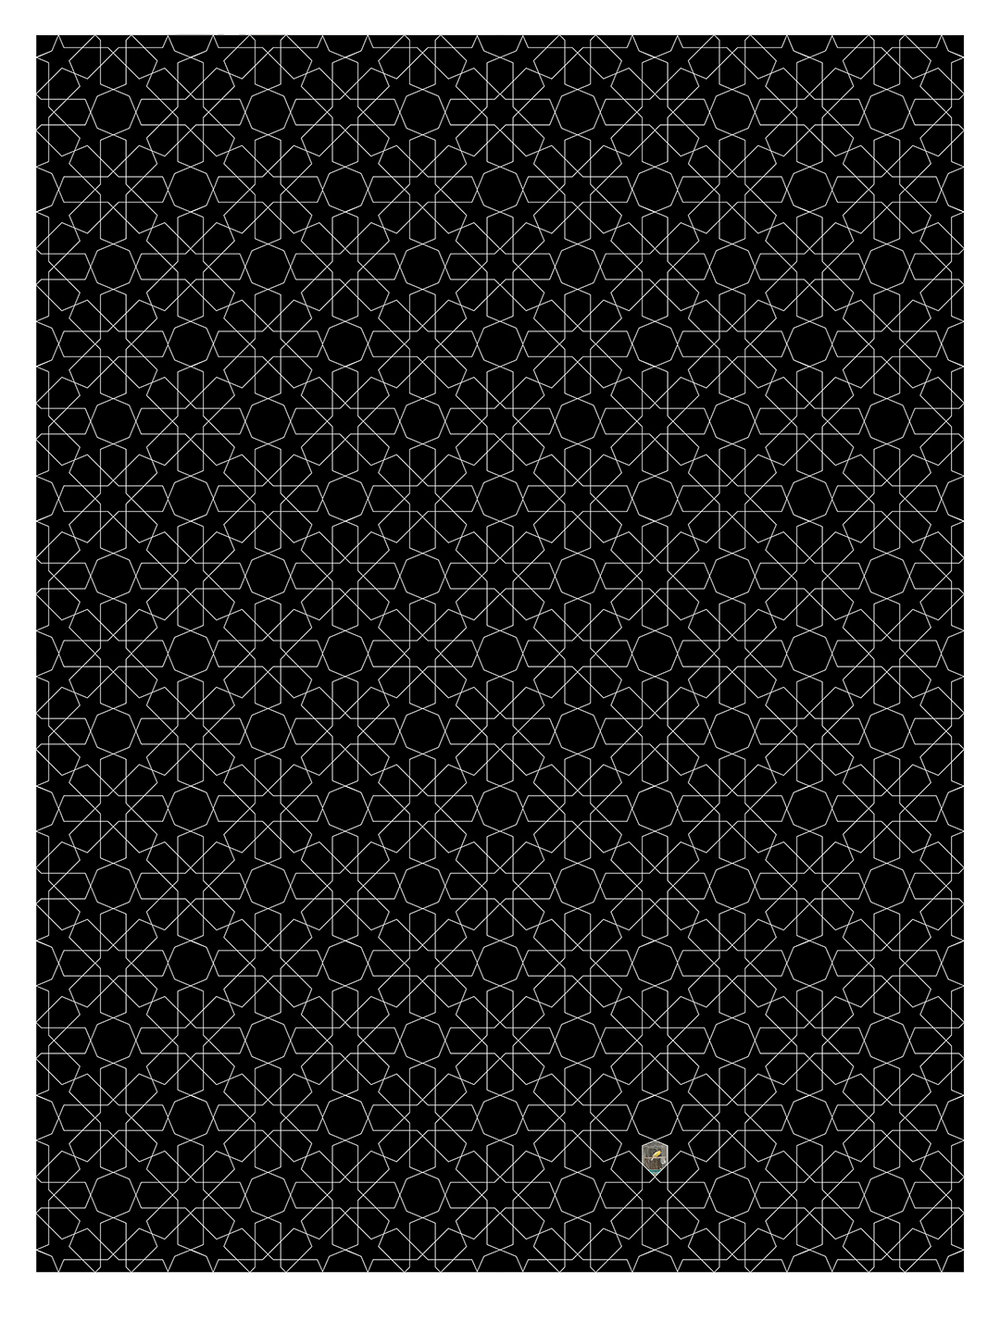 Static (visual Snow) 03 (Black)